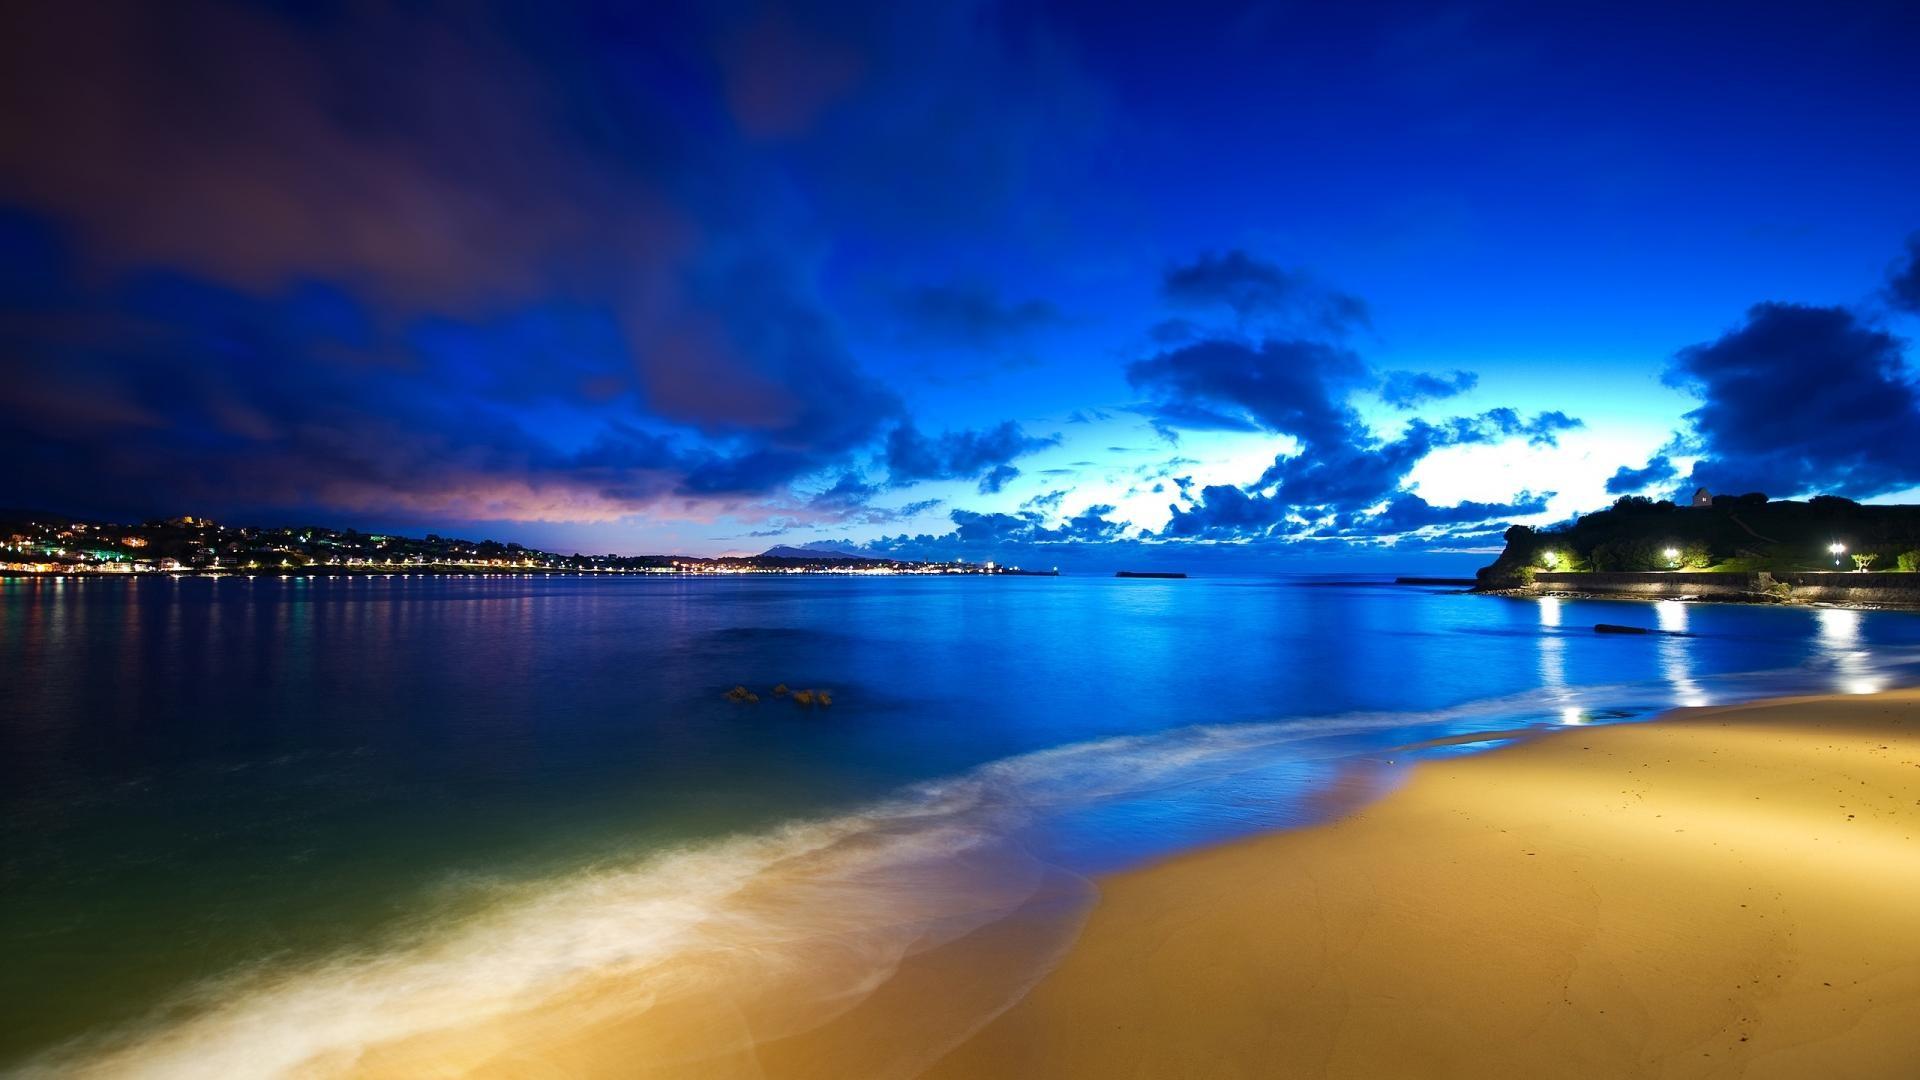 Beach Wallpapers at Night HD Wallpaper